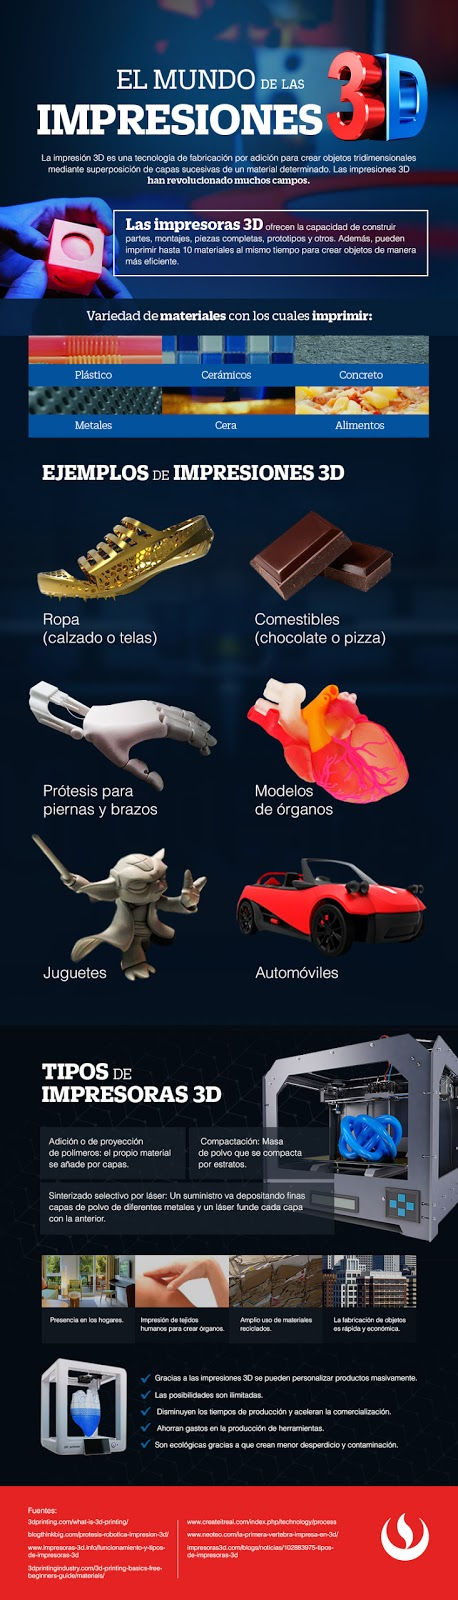 INFOGRAFIA DE LAS IMPRESIONES 3D